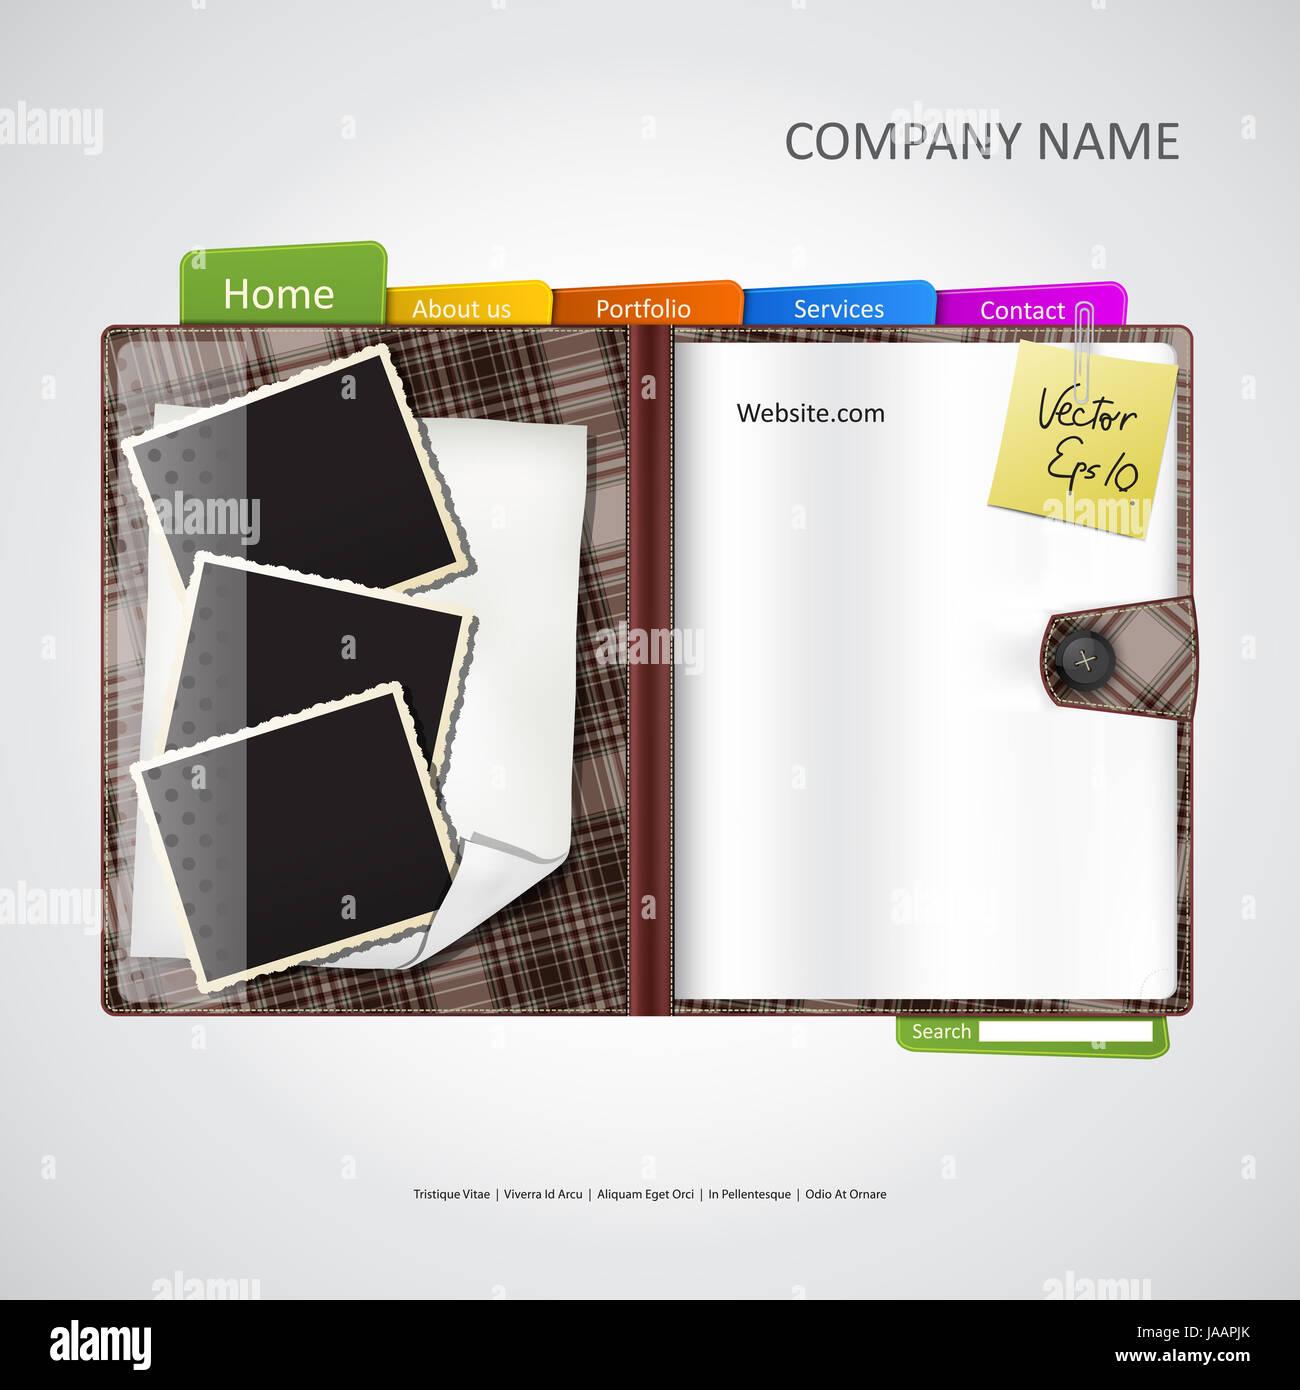 Website Template Agenda Stockfotos & Website Template Agenda Bilder ...